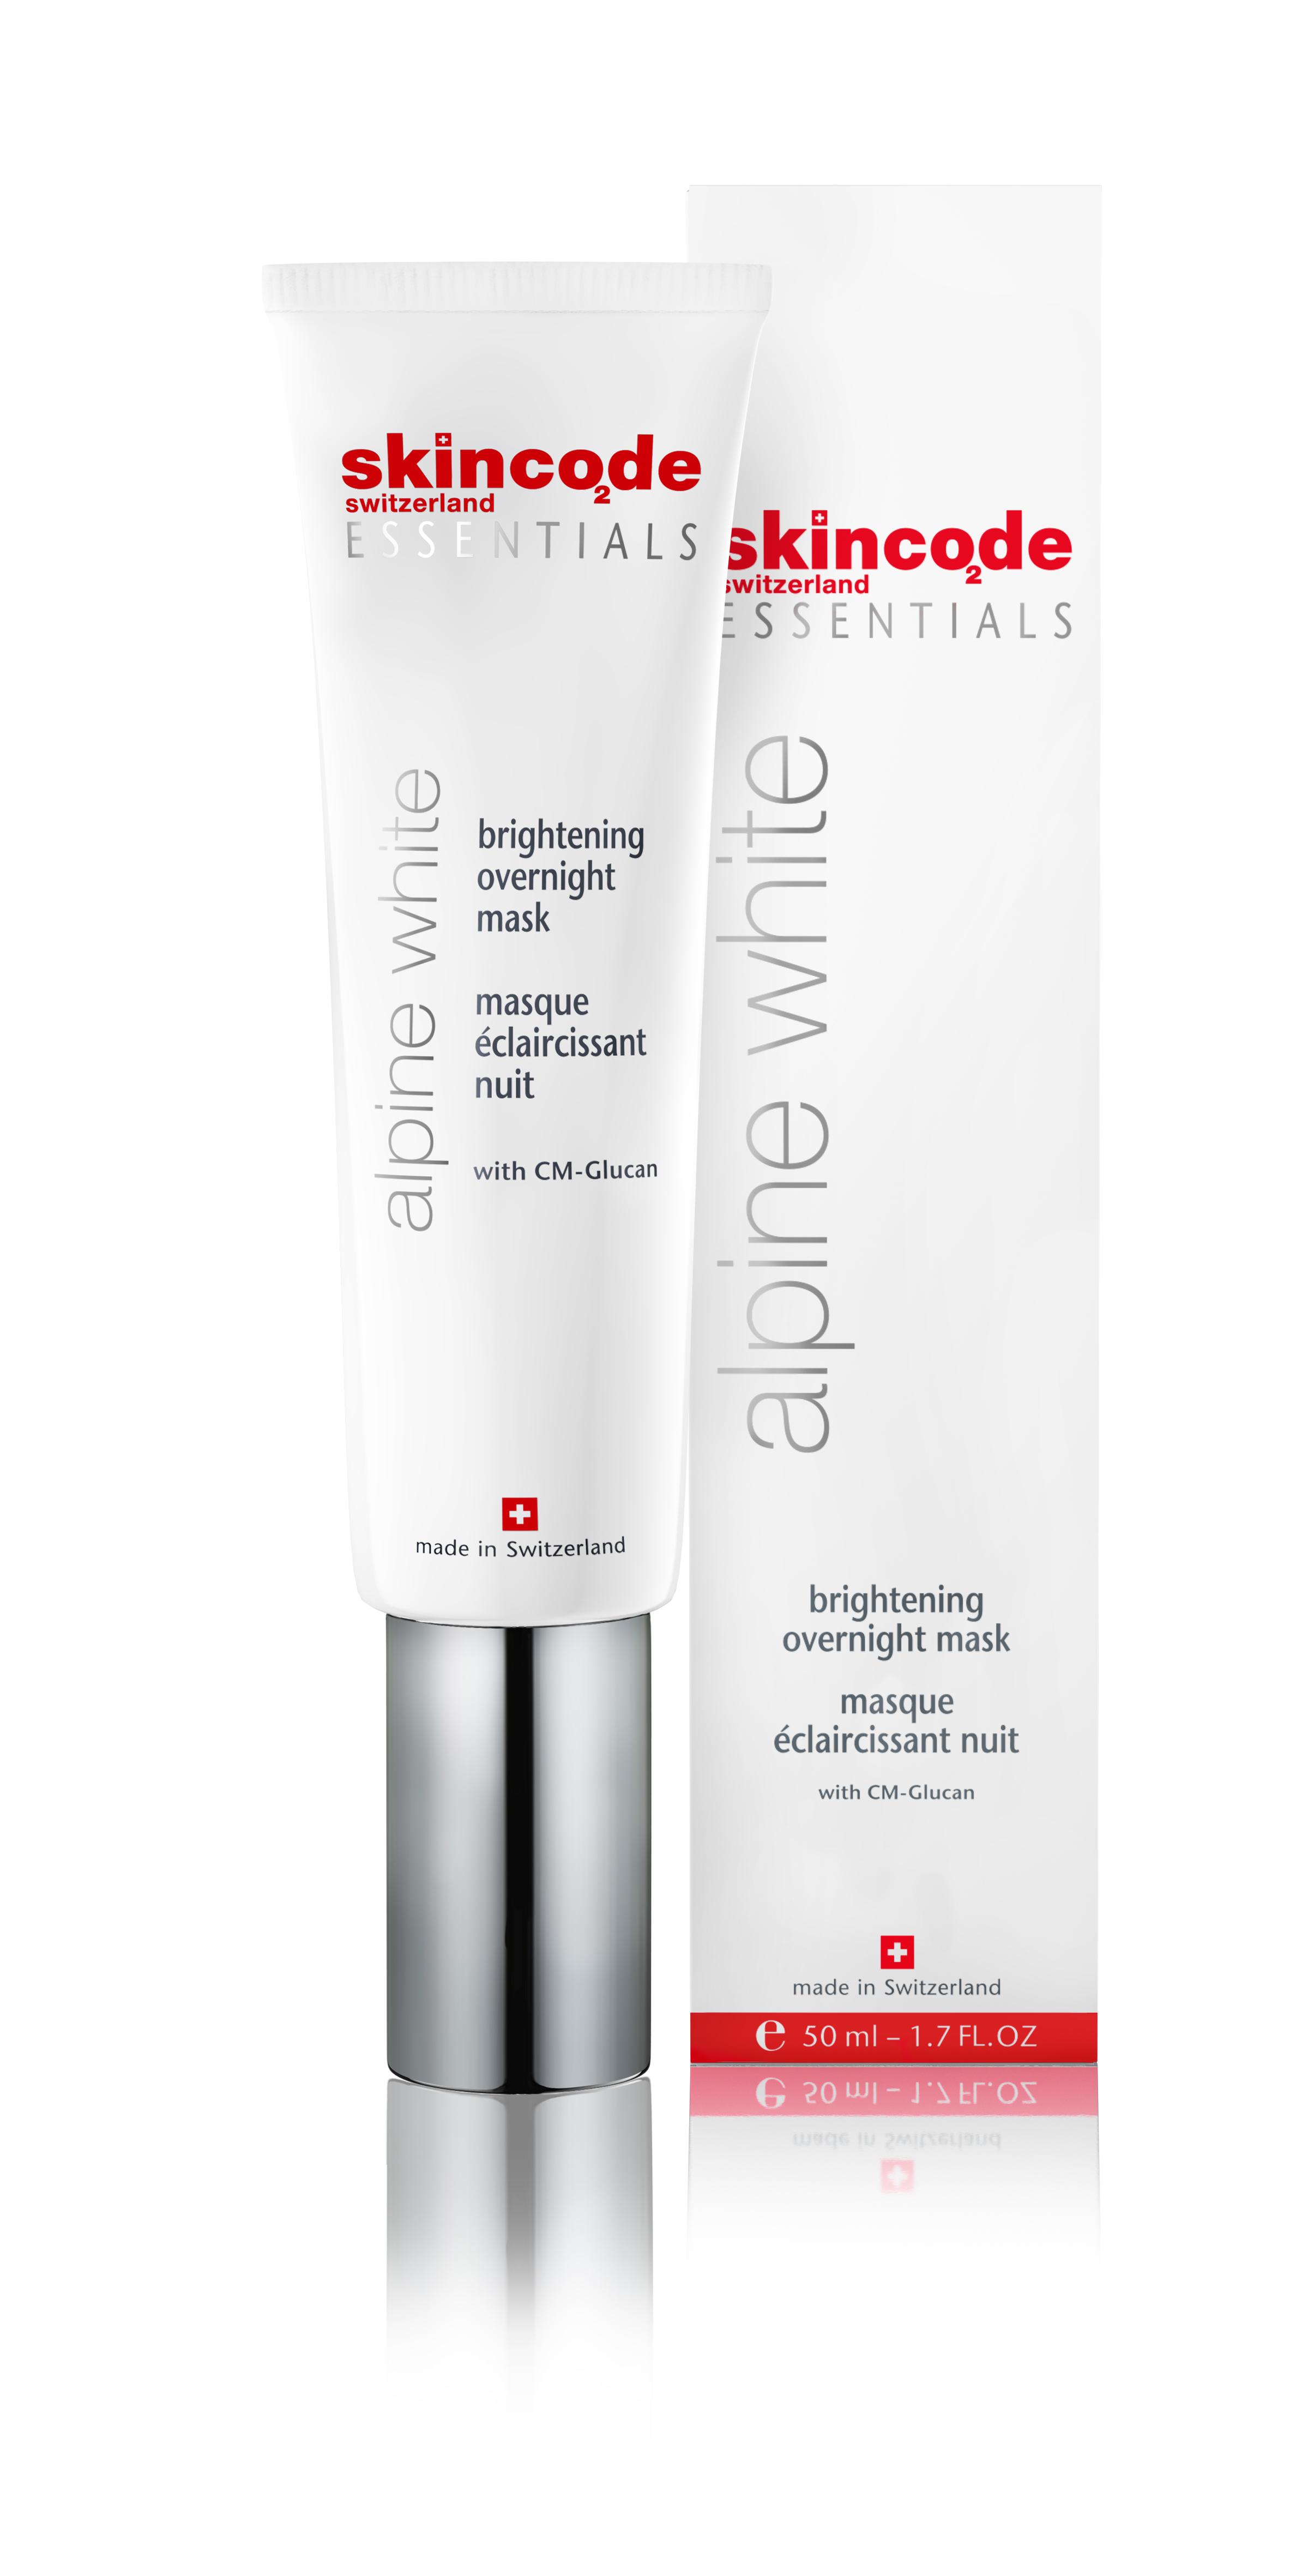 Skincode Essentials Alpine White Brightening Overnight Mask 50ml 6 Pack Cetaphil Men Daily Face Lotion SPF 15 - 4 fl oz Each